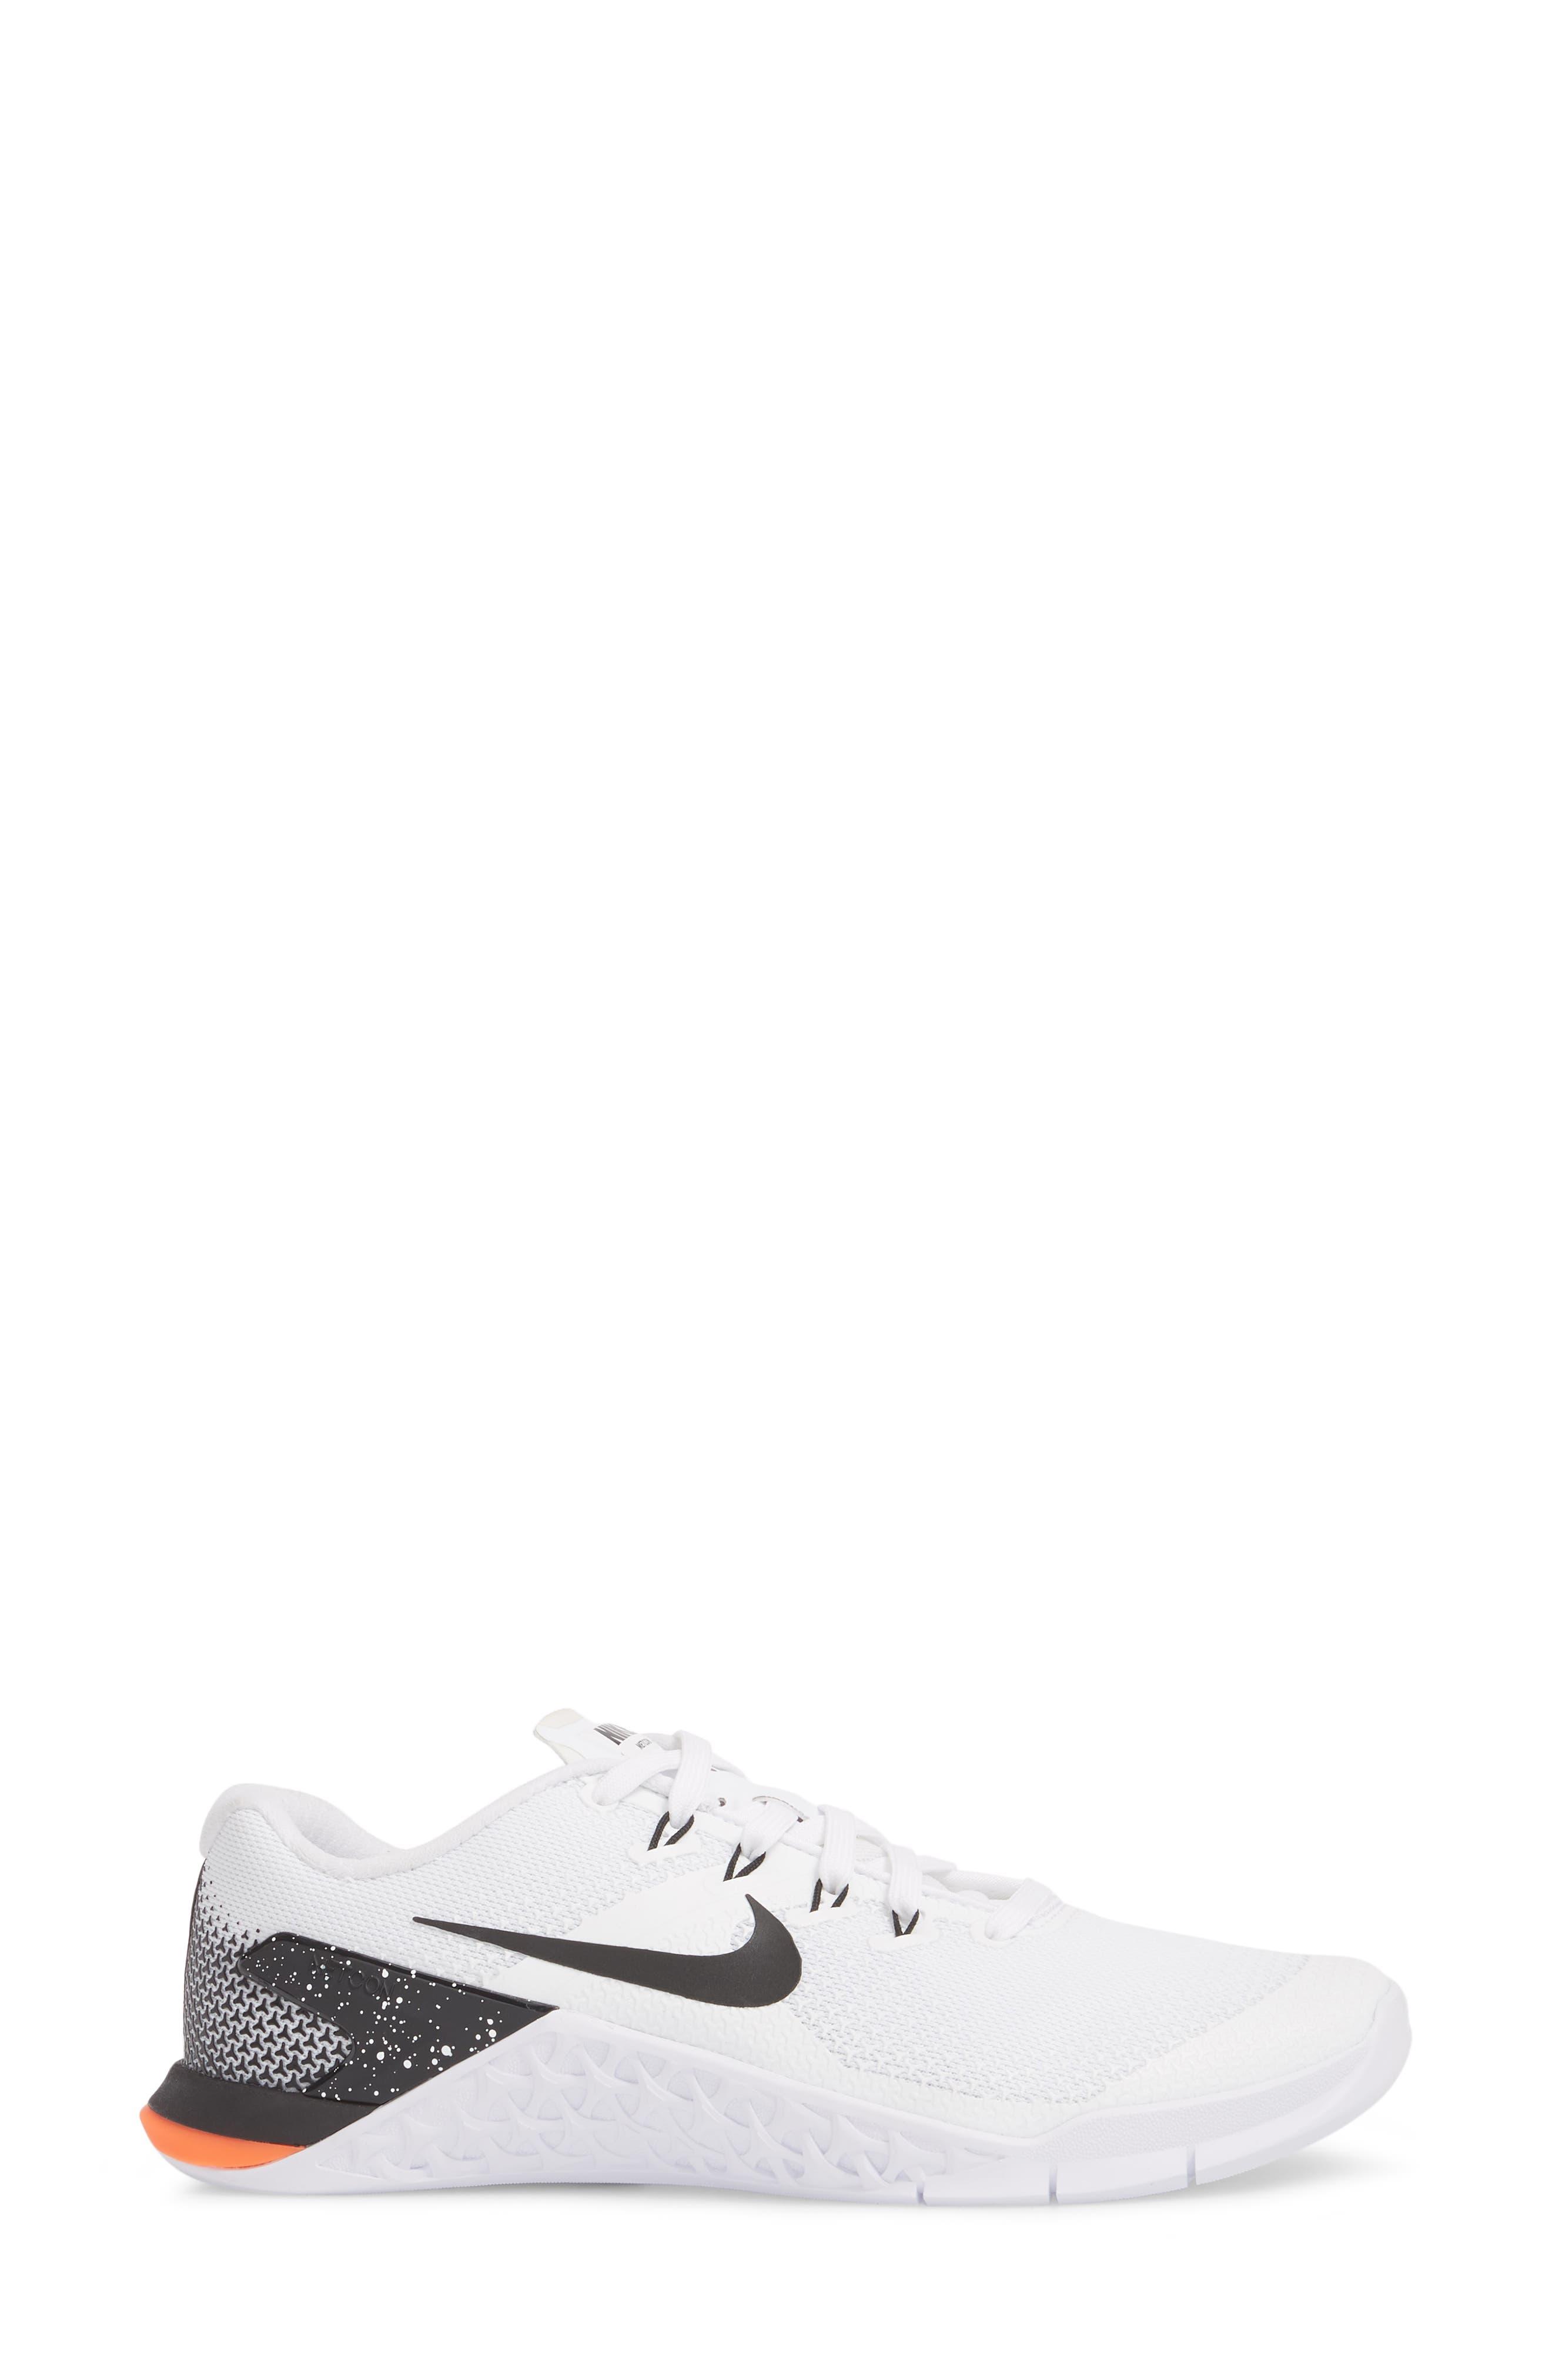 Alternate Image 3  - Nike Metcon 4 Training Shoe (Women)